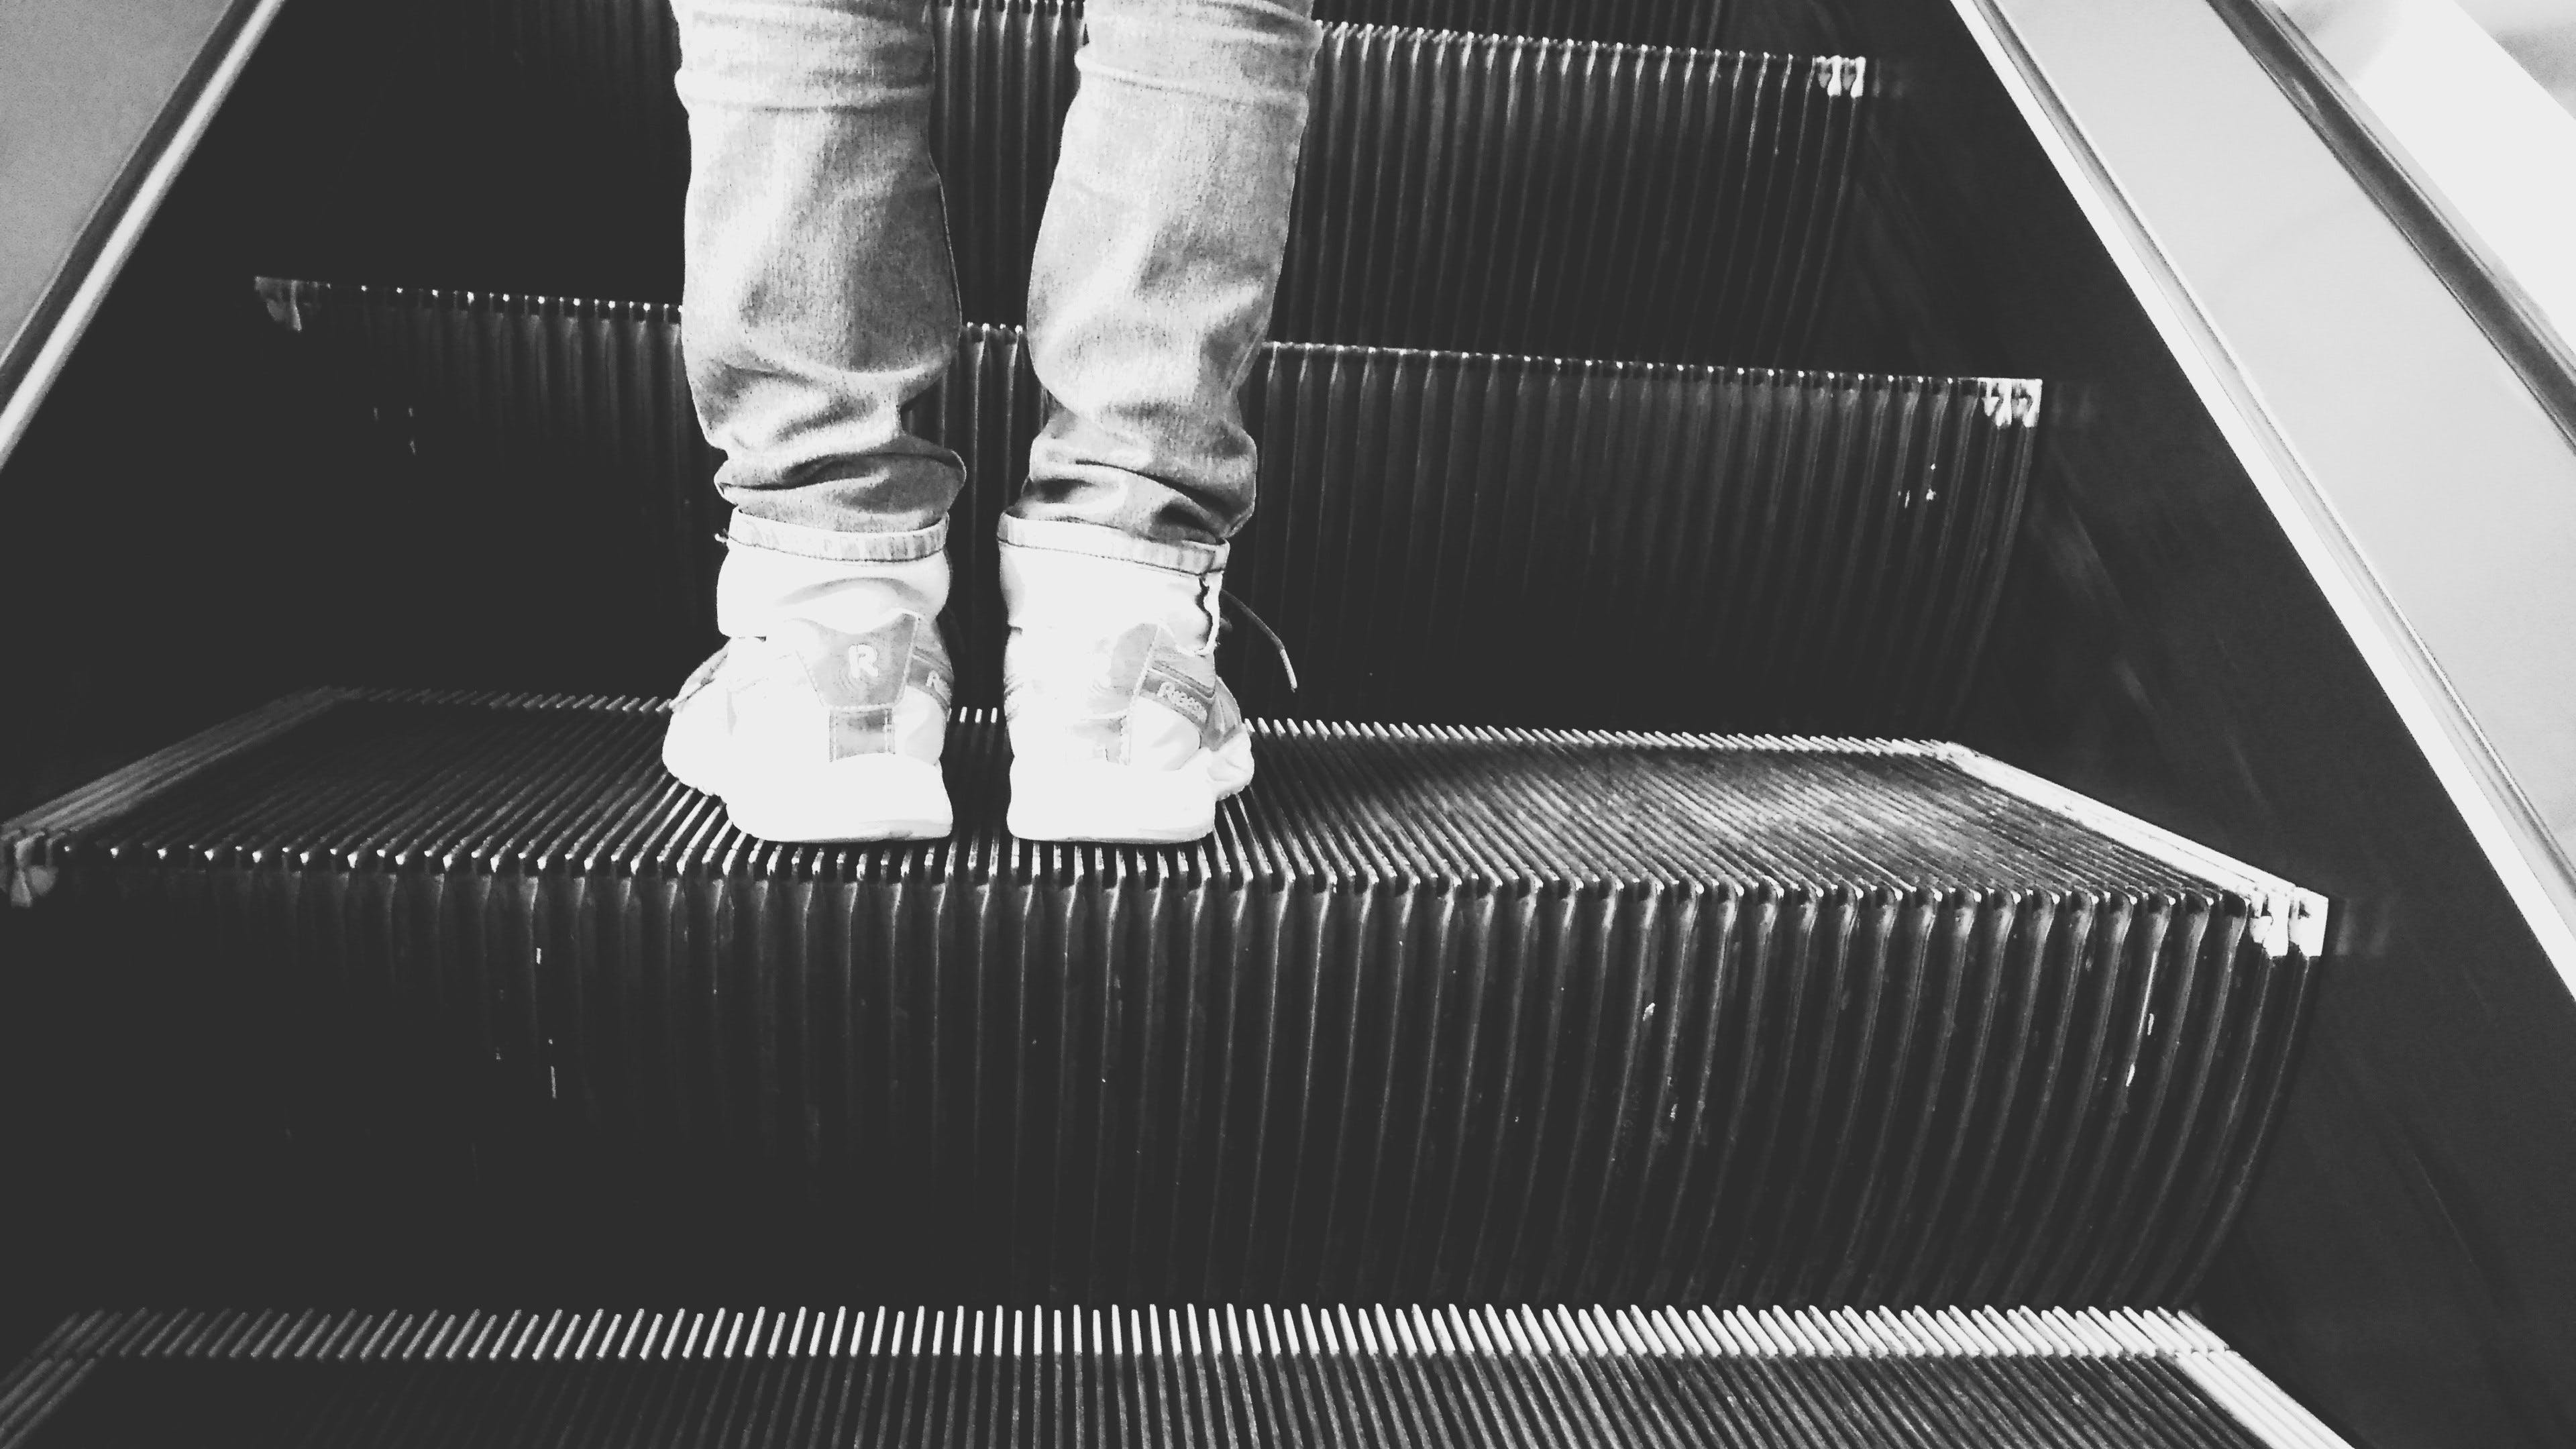 Free stock photo of black-and-white, feet, shoes, escalator